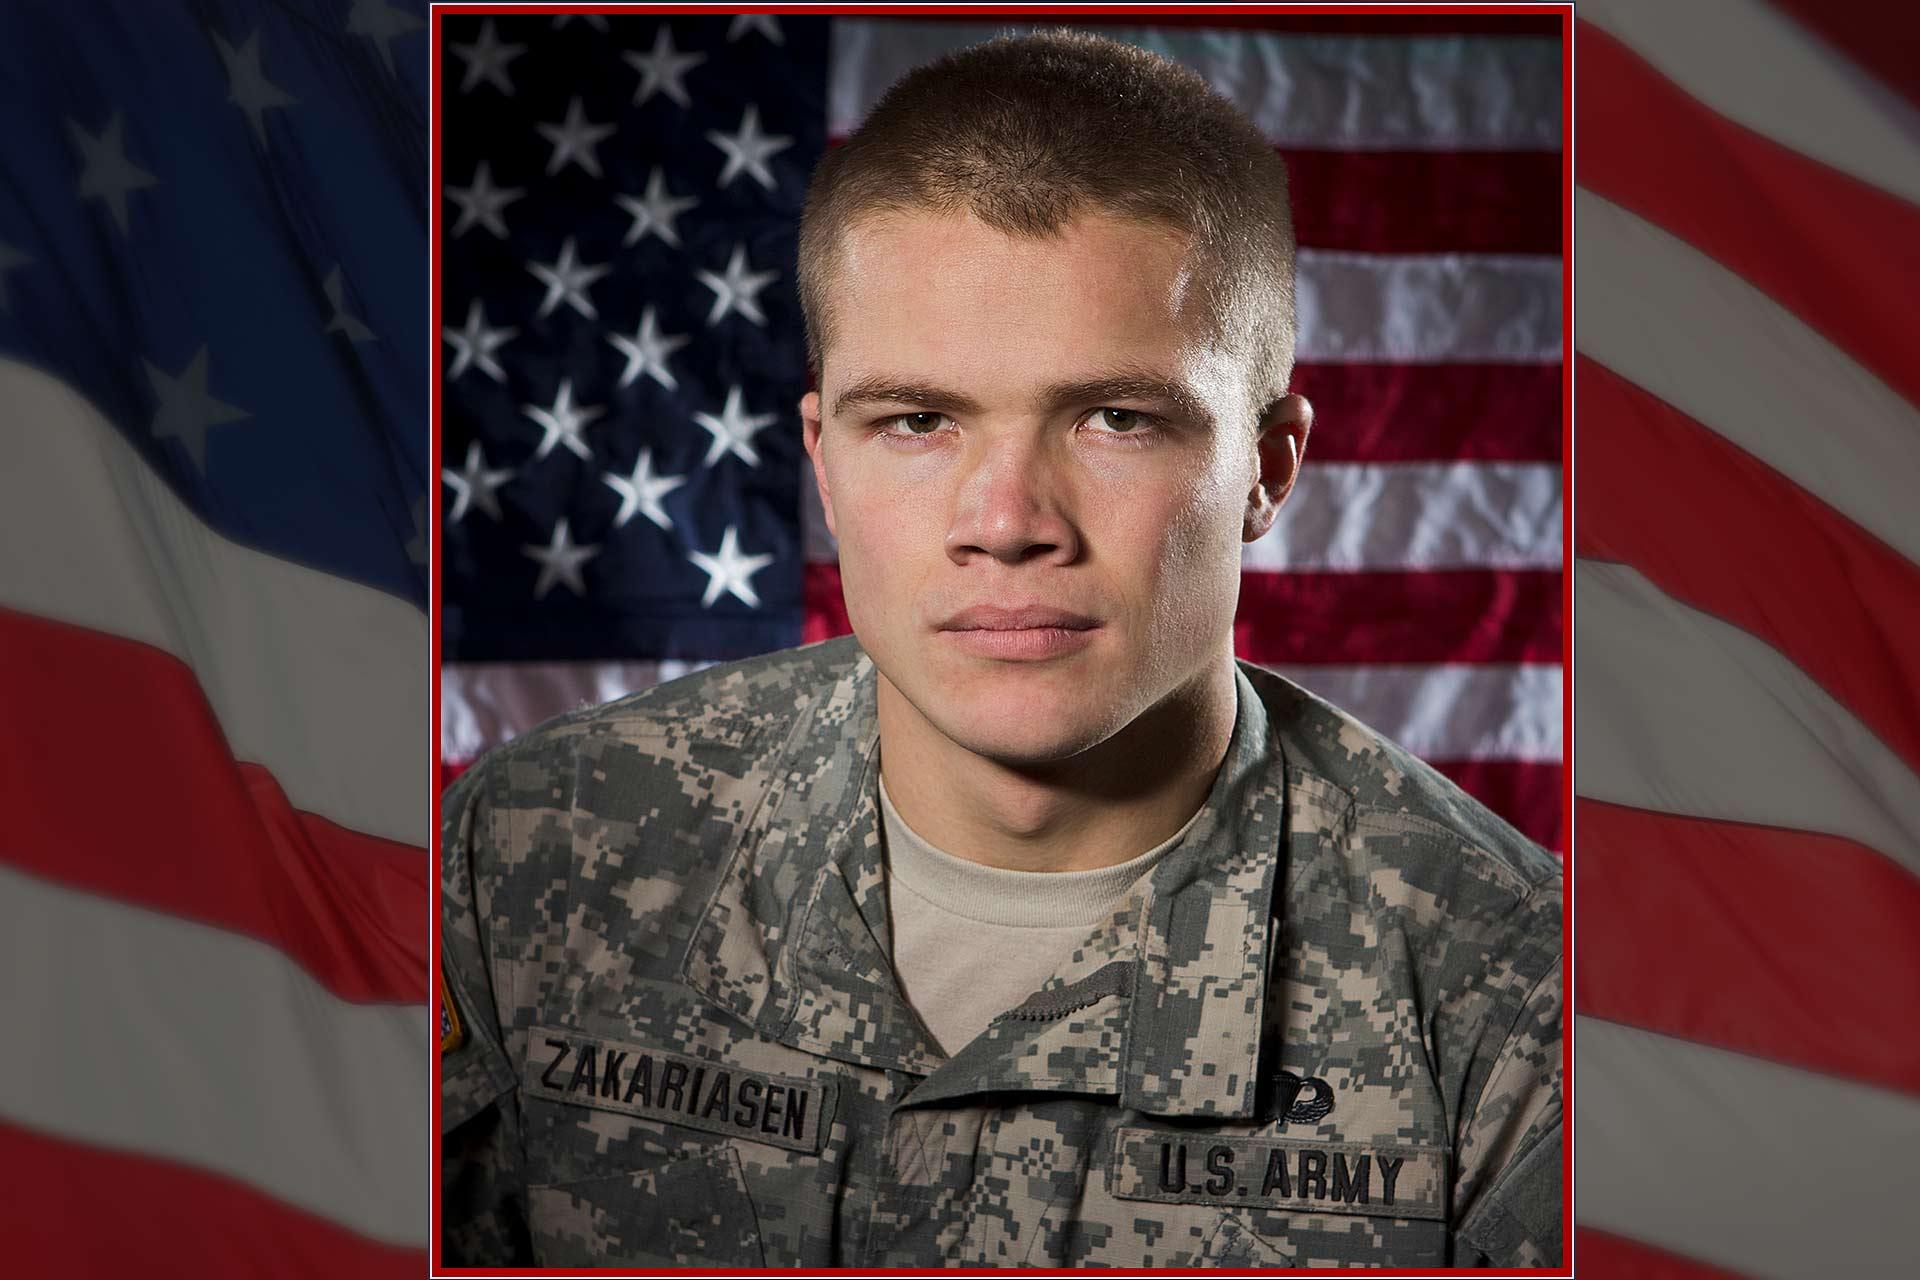 Military Portrait Photographer